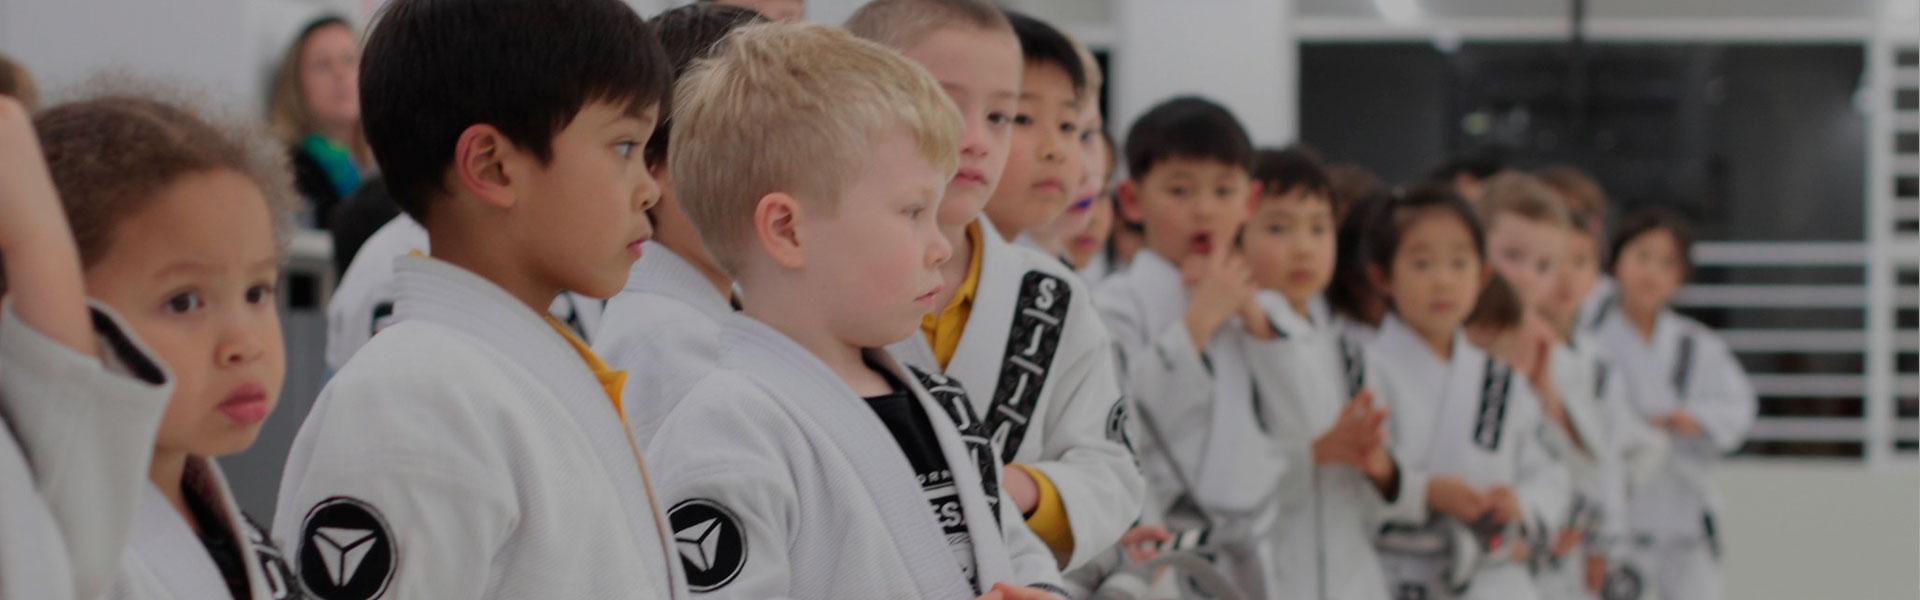 Jiu Jitsu for Kids in Sydney